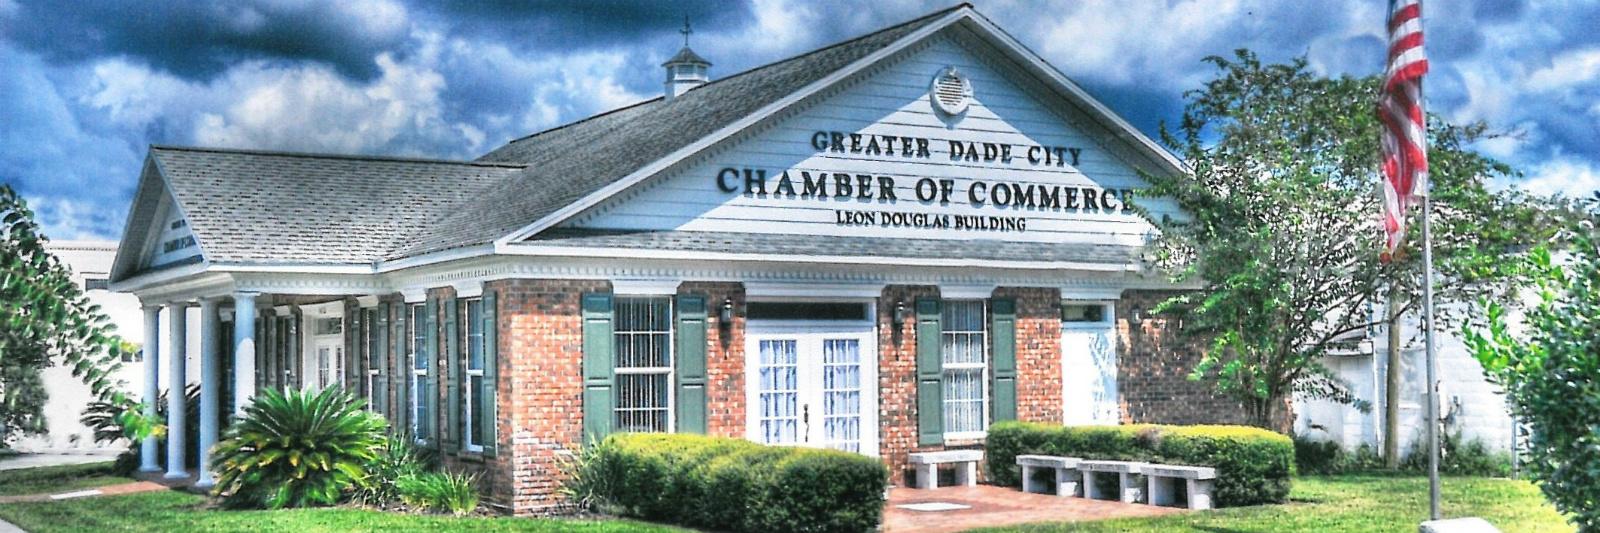 Chamber-pic-by-Richard-Riley-2-21-14.jpg